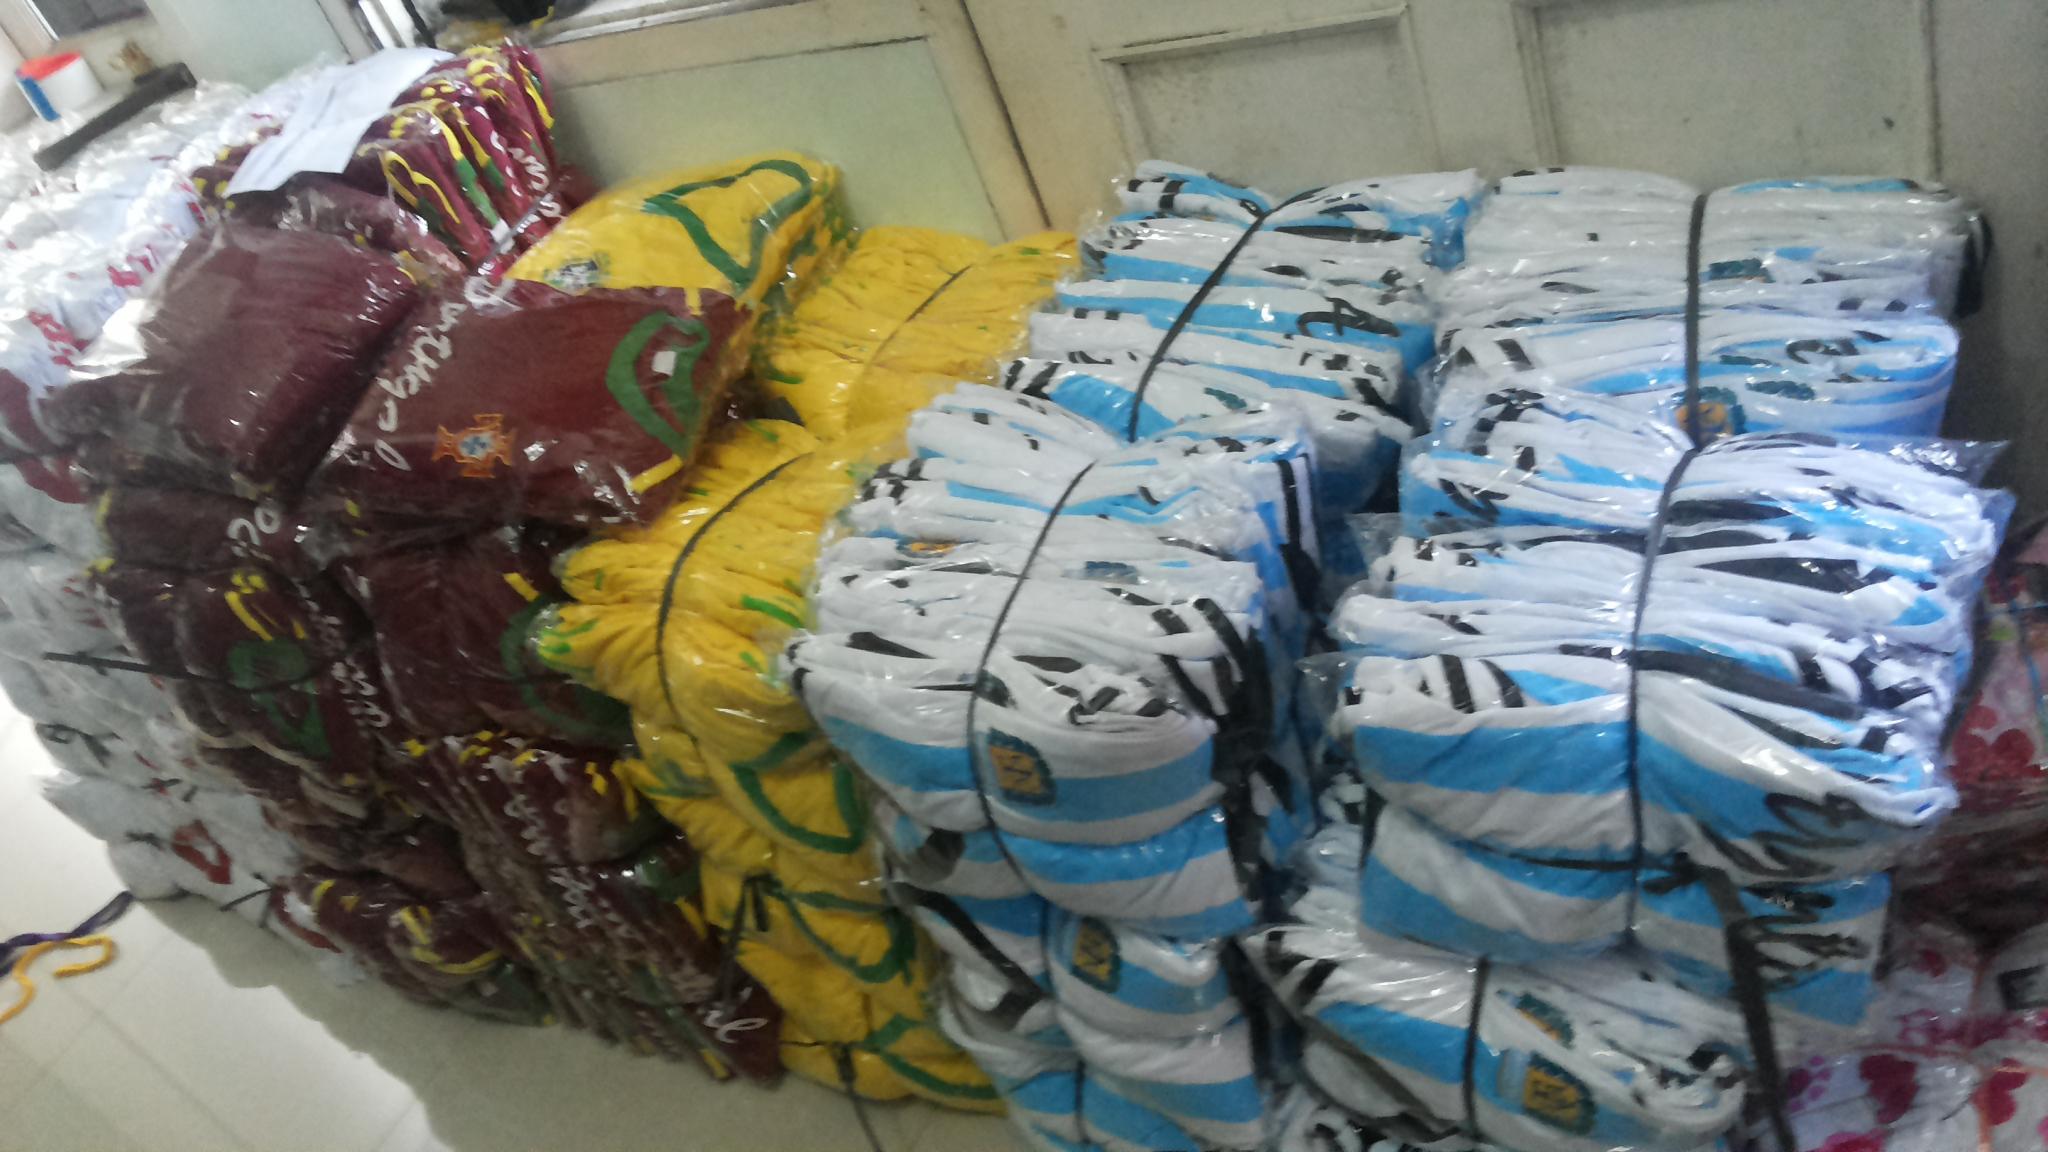 Pusat Obral Grosir Baju Anak 5000 Mukena Katun Jepang Murah Meriah Langsung Dari Pabrik Grosir Kaos Bola Piala Dunia 2014 Murah cuma 8rb